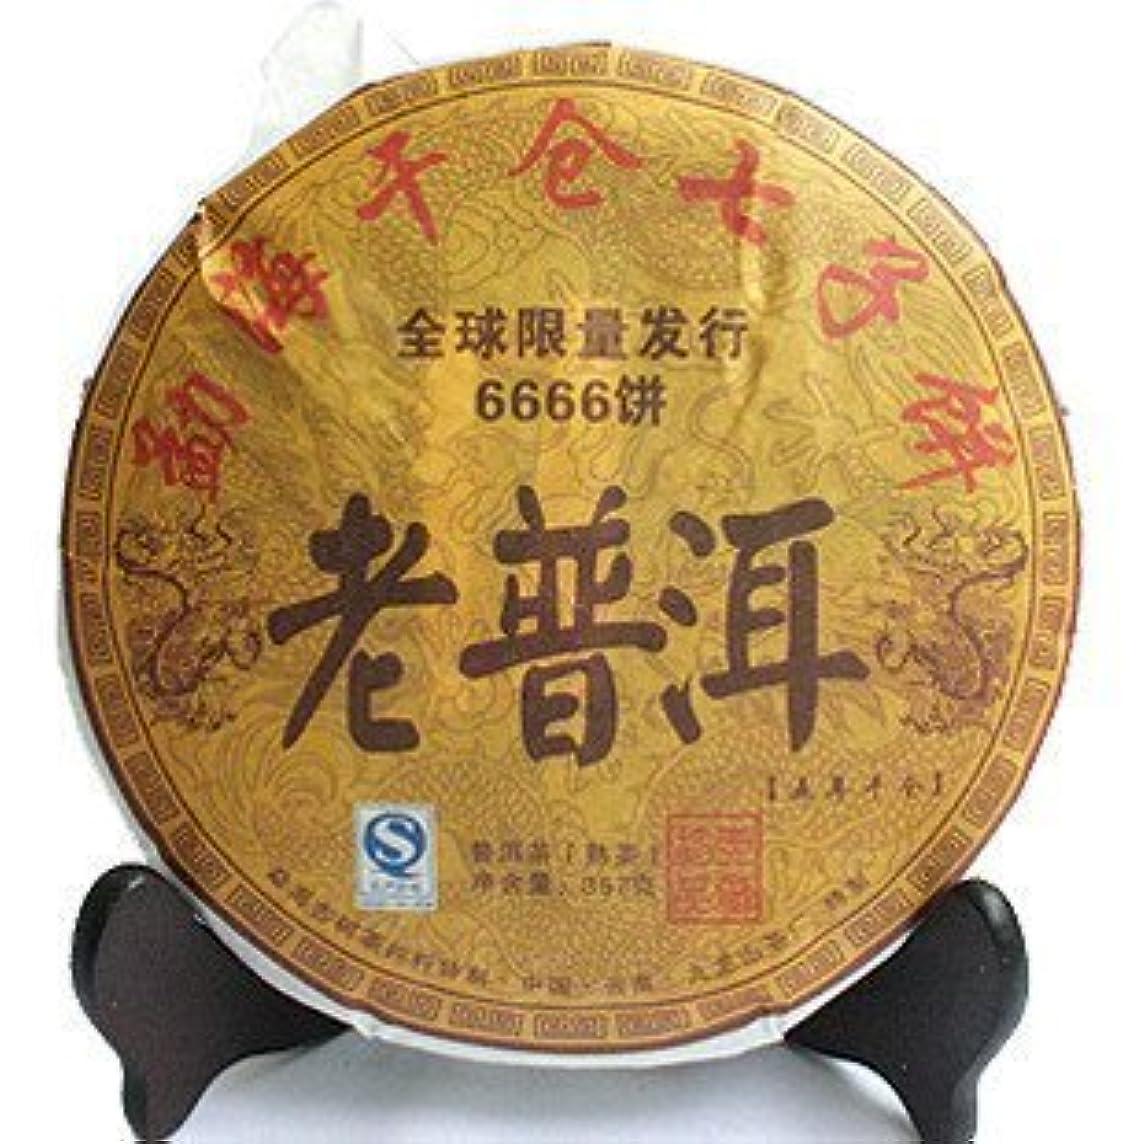 Amaranteen - Tea Pu Er The China Naturally Organic Matcha Health Care Cooked The Tea Puer 5 Years Old 357G Chinese Yunnan Ripe Puerh